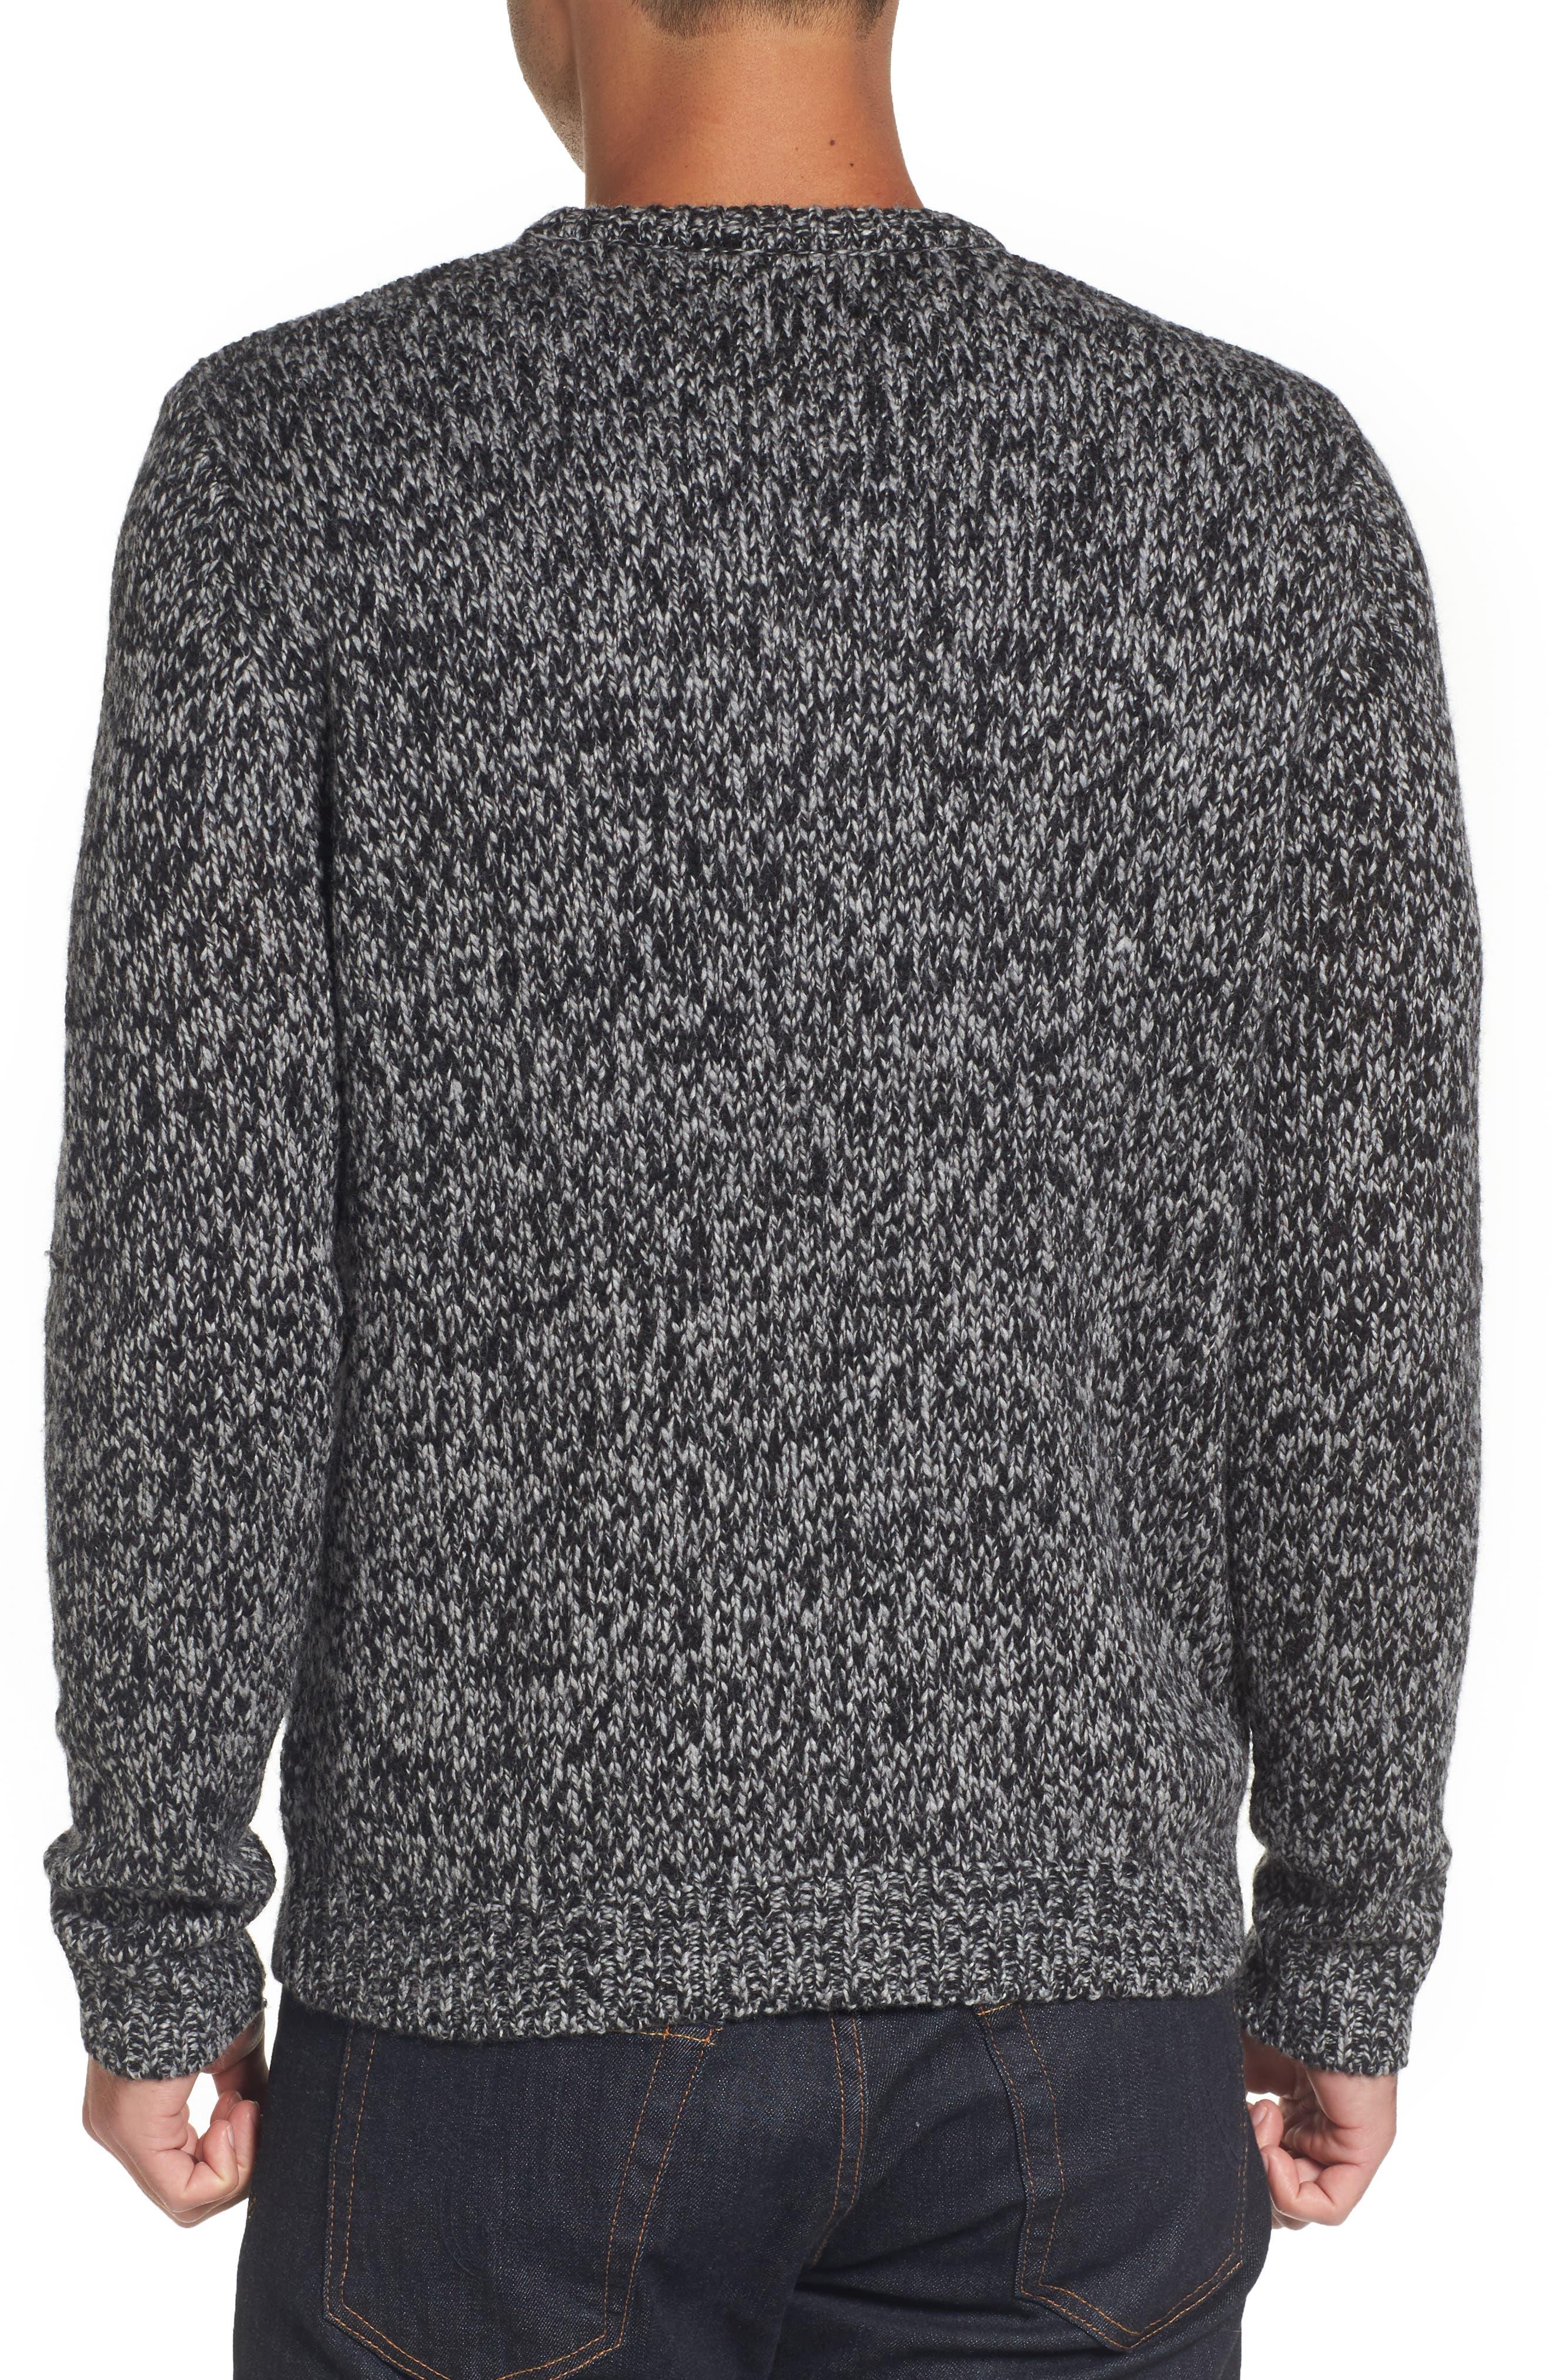 Alternate Image 2  - Nordstrom Men's Shop Marled Yarn Sweater